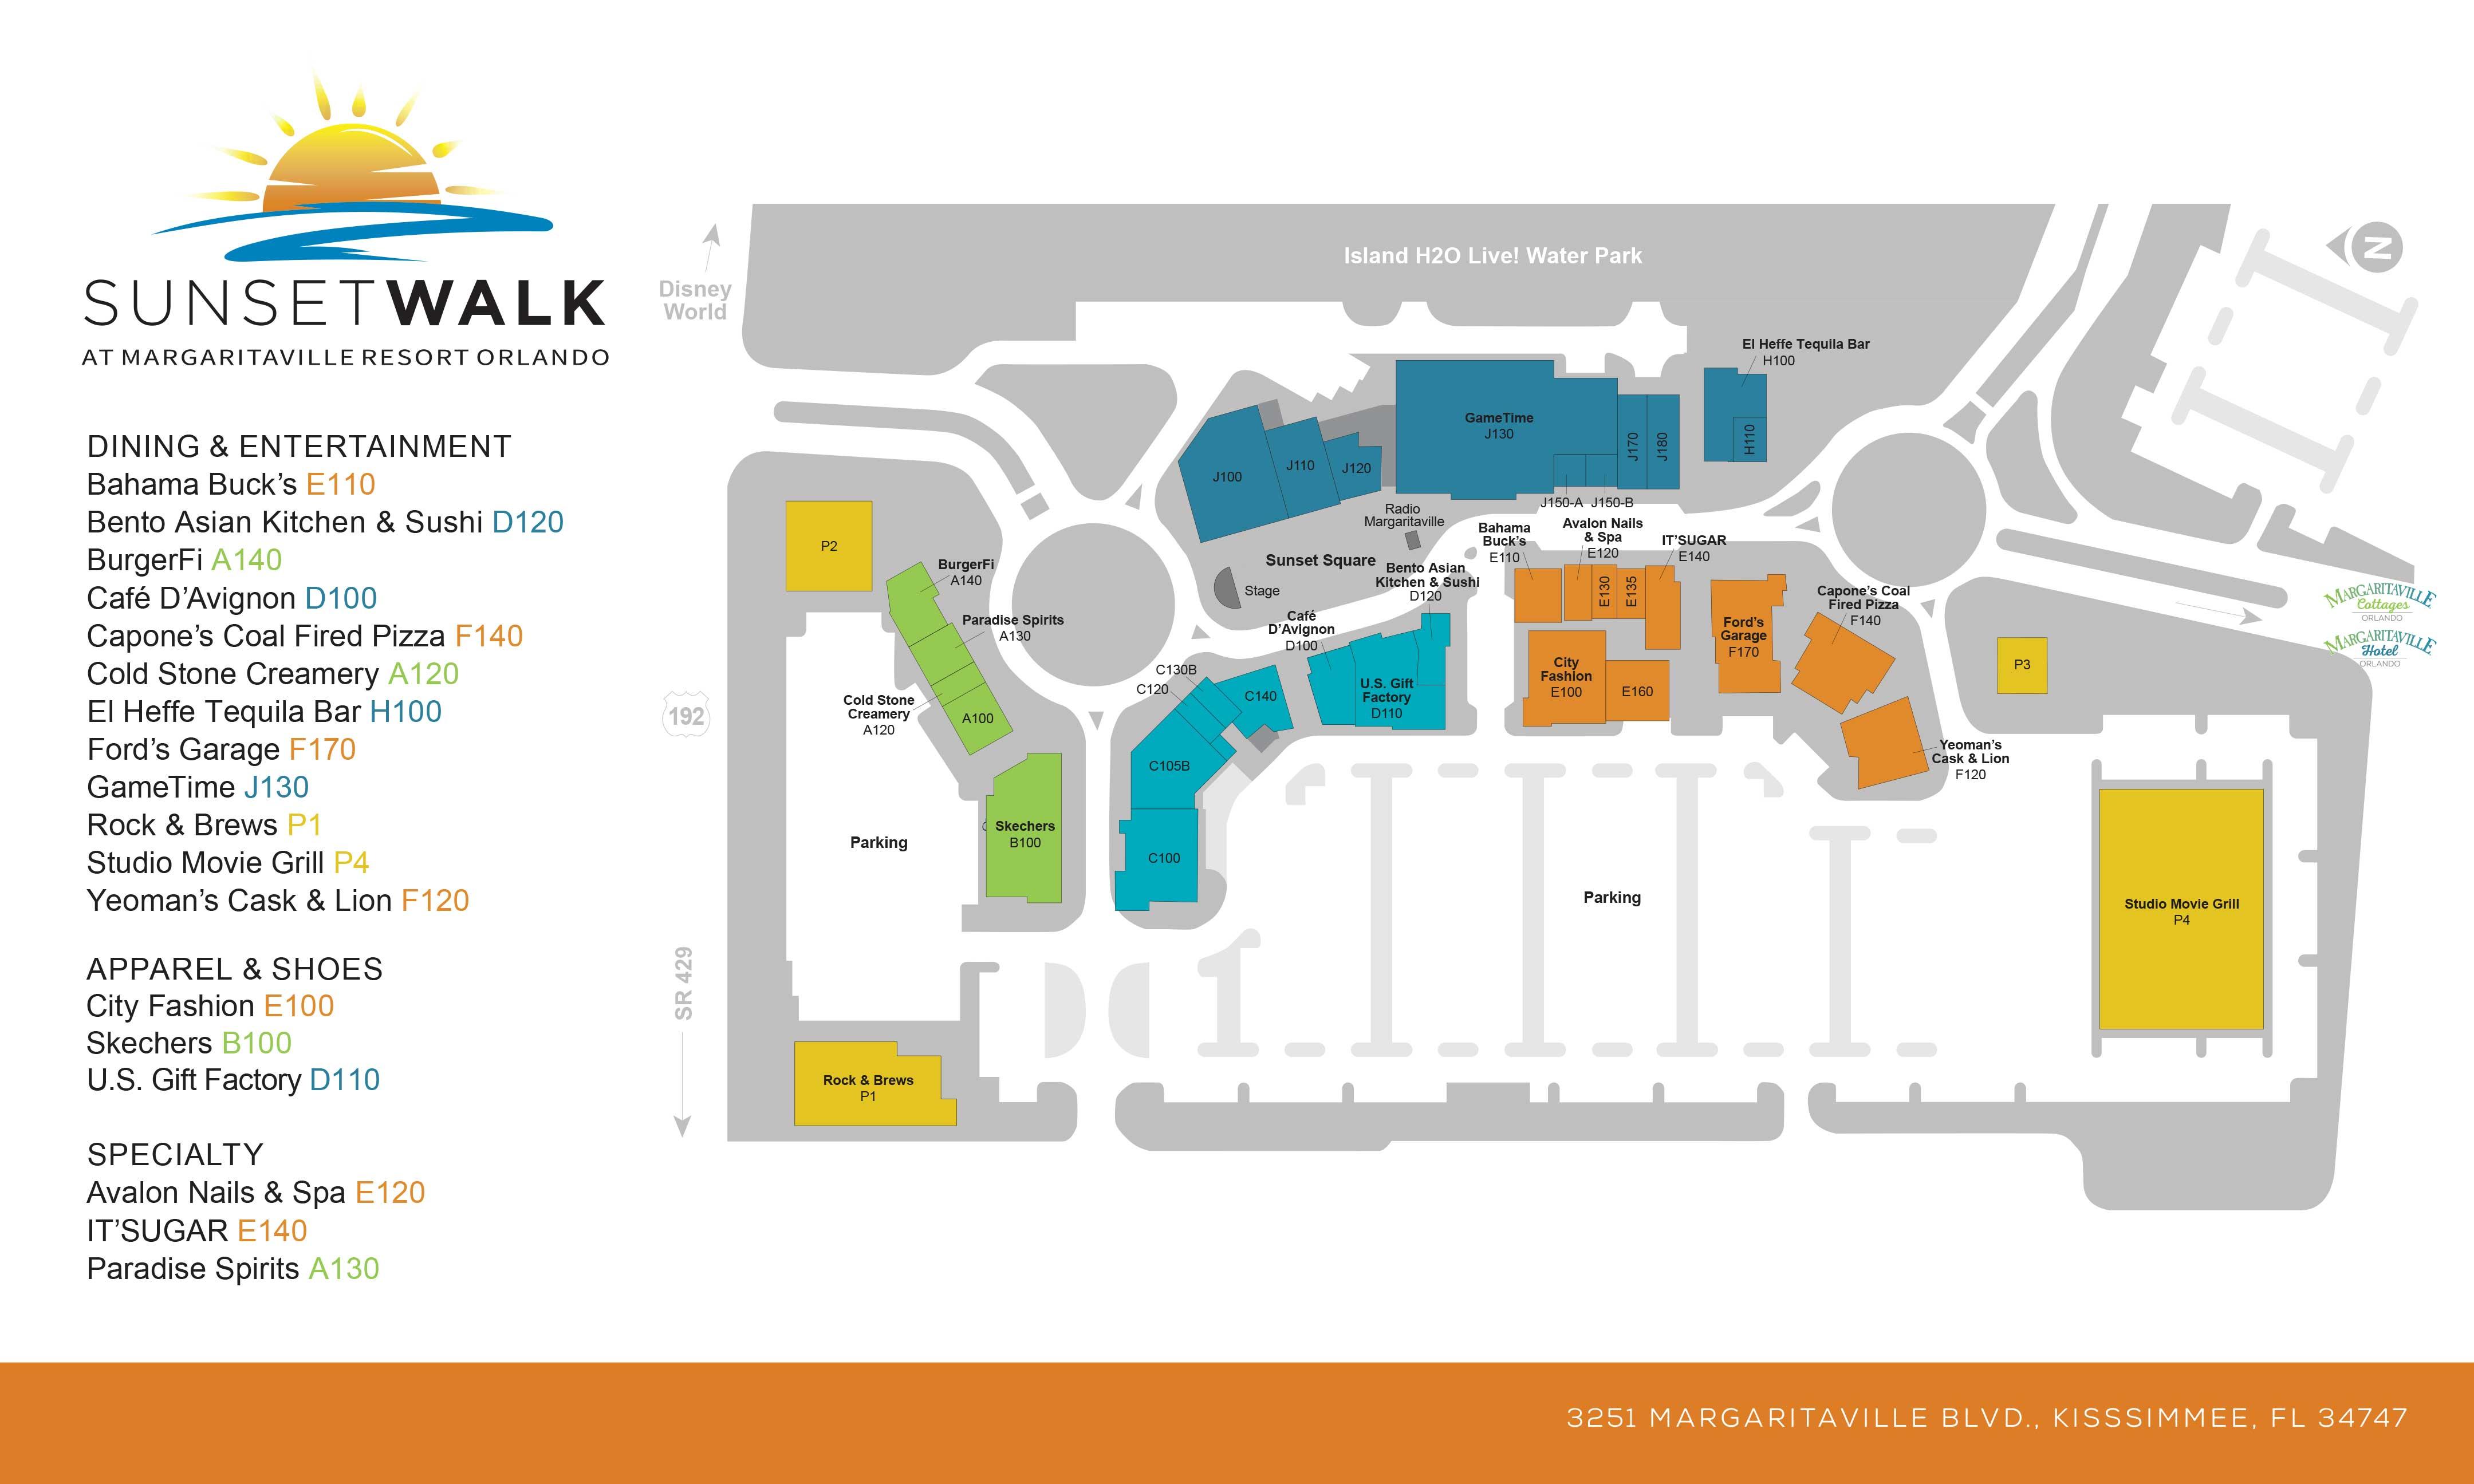 Sunset Walk at Margaritaville Resort Orlando site map